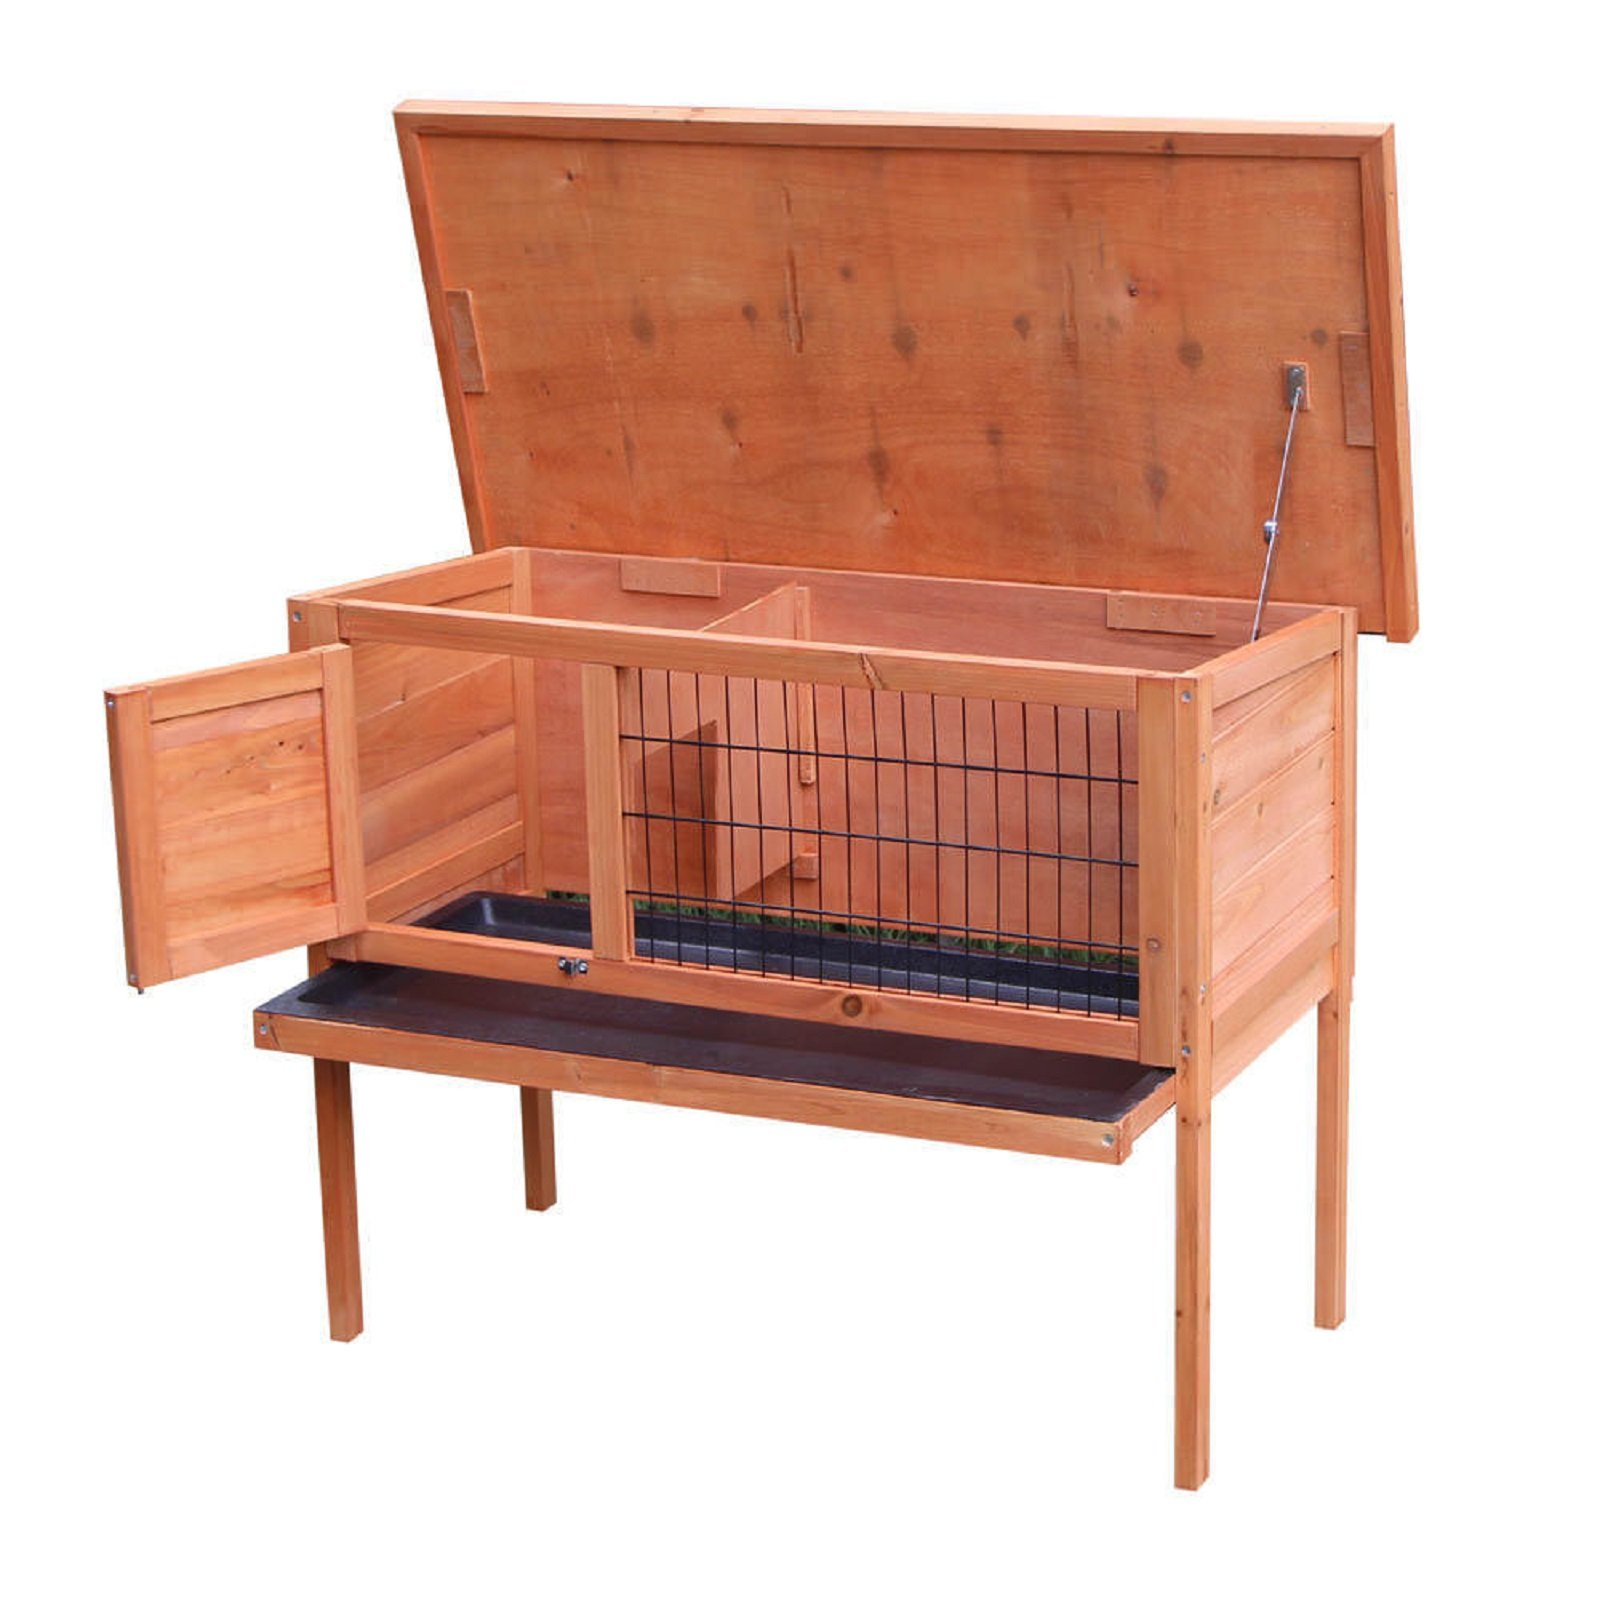 HOT! 36'' Waterproof Wooden Chicken Coop Hen House Pet Animal Poultry Cage Rabbit Hutch